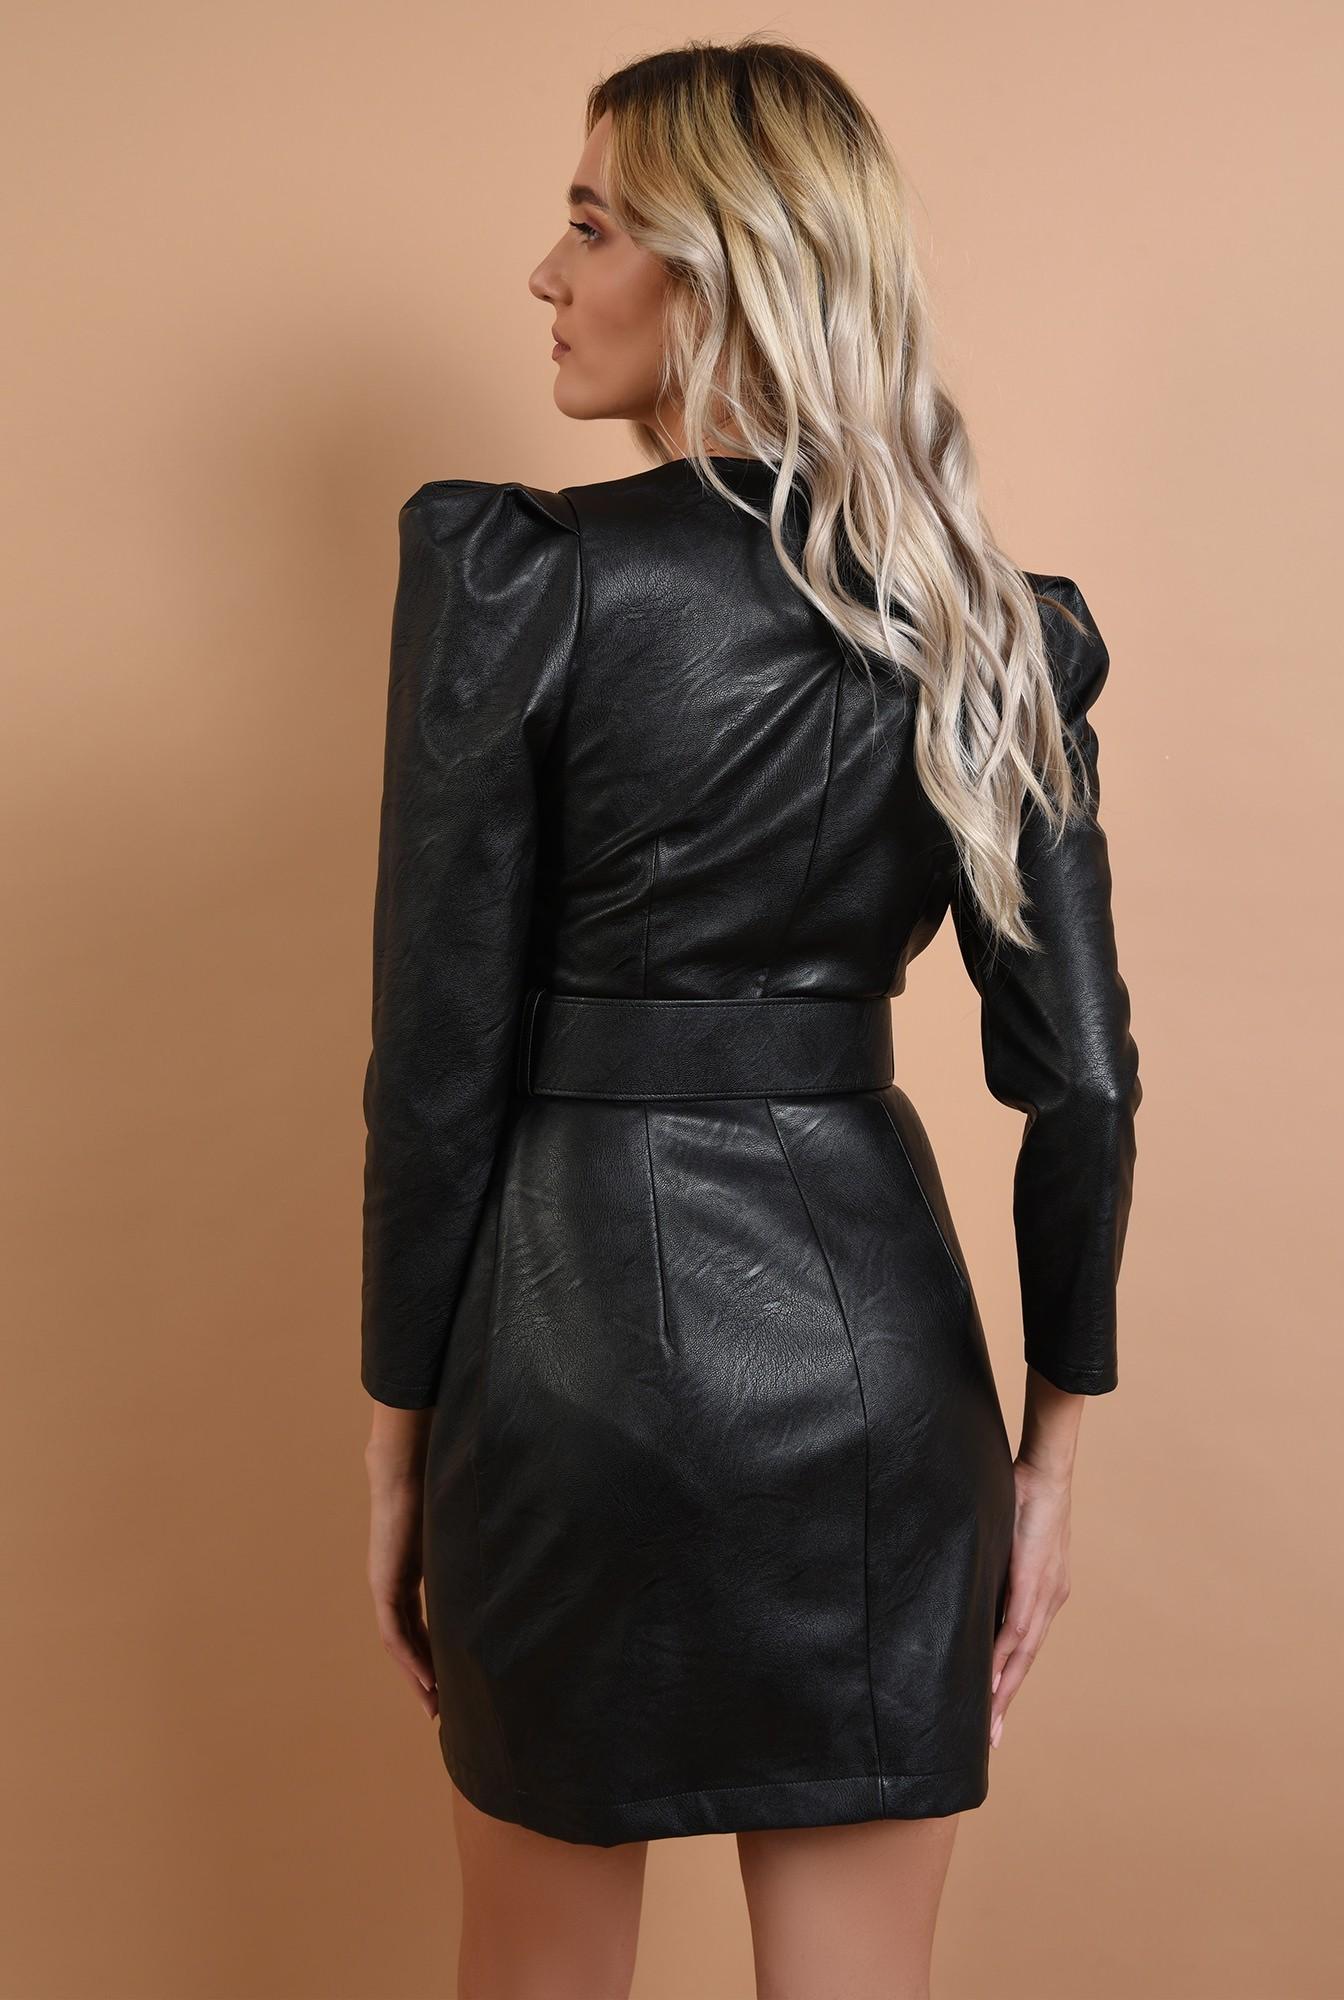 1 - rochie neagra, mini, cu nasturi metalici, curea, Poema